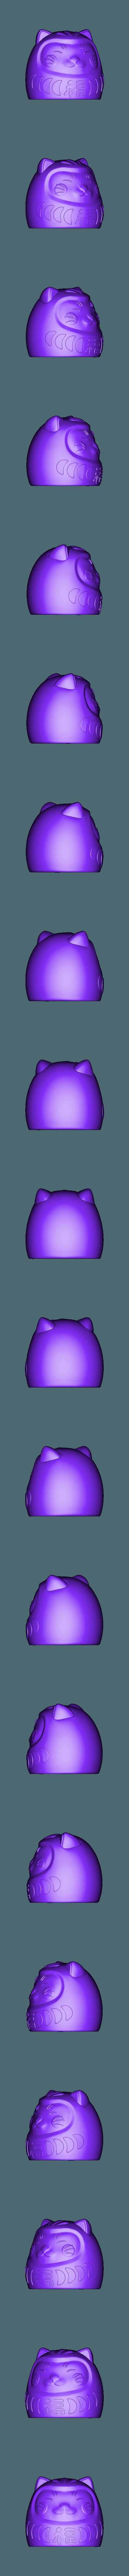 Daruma_Body.stl Télécharger fichier STL gratuit DARUMA-NEKO • Design pour impression 3D, imaginestudio